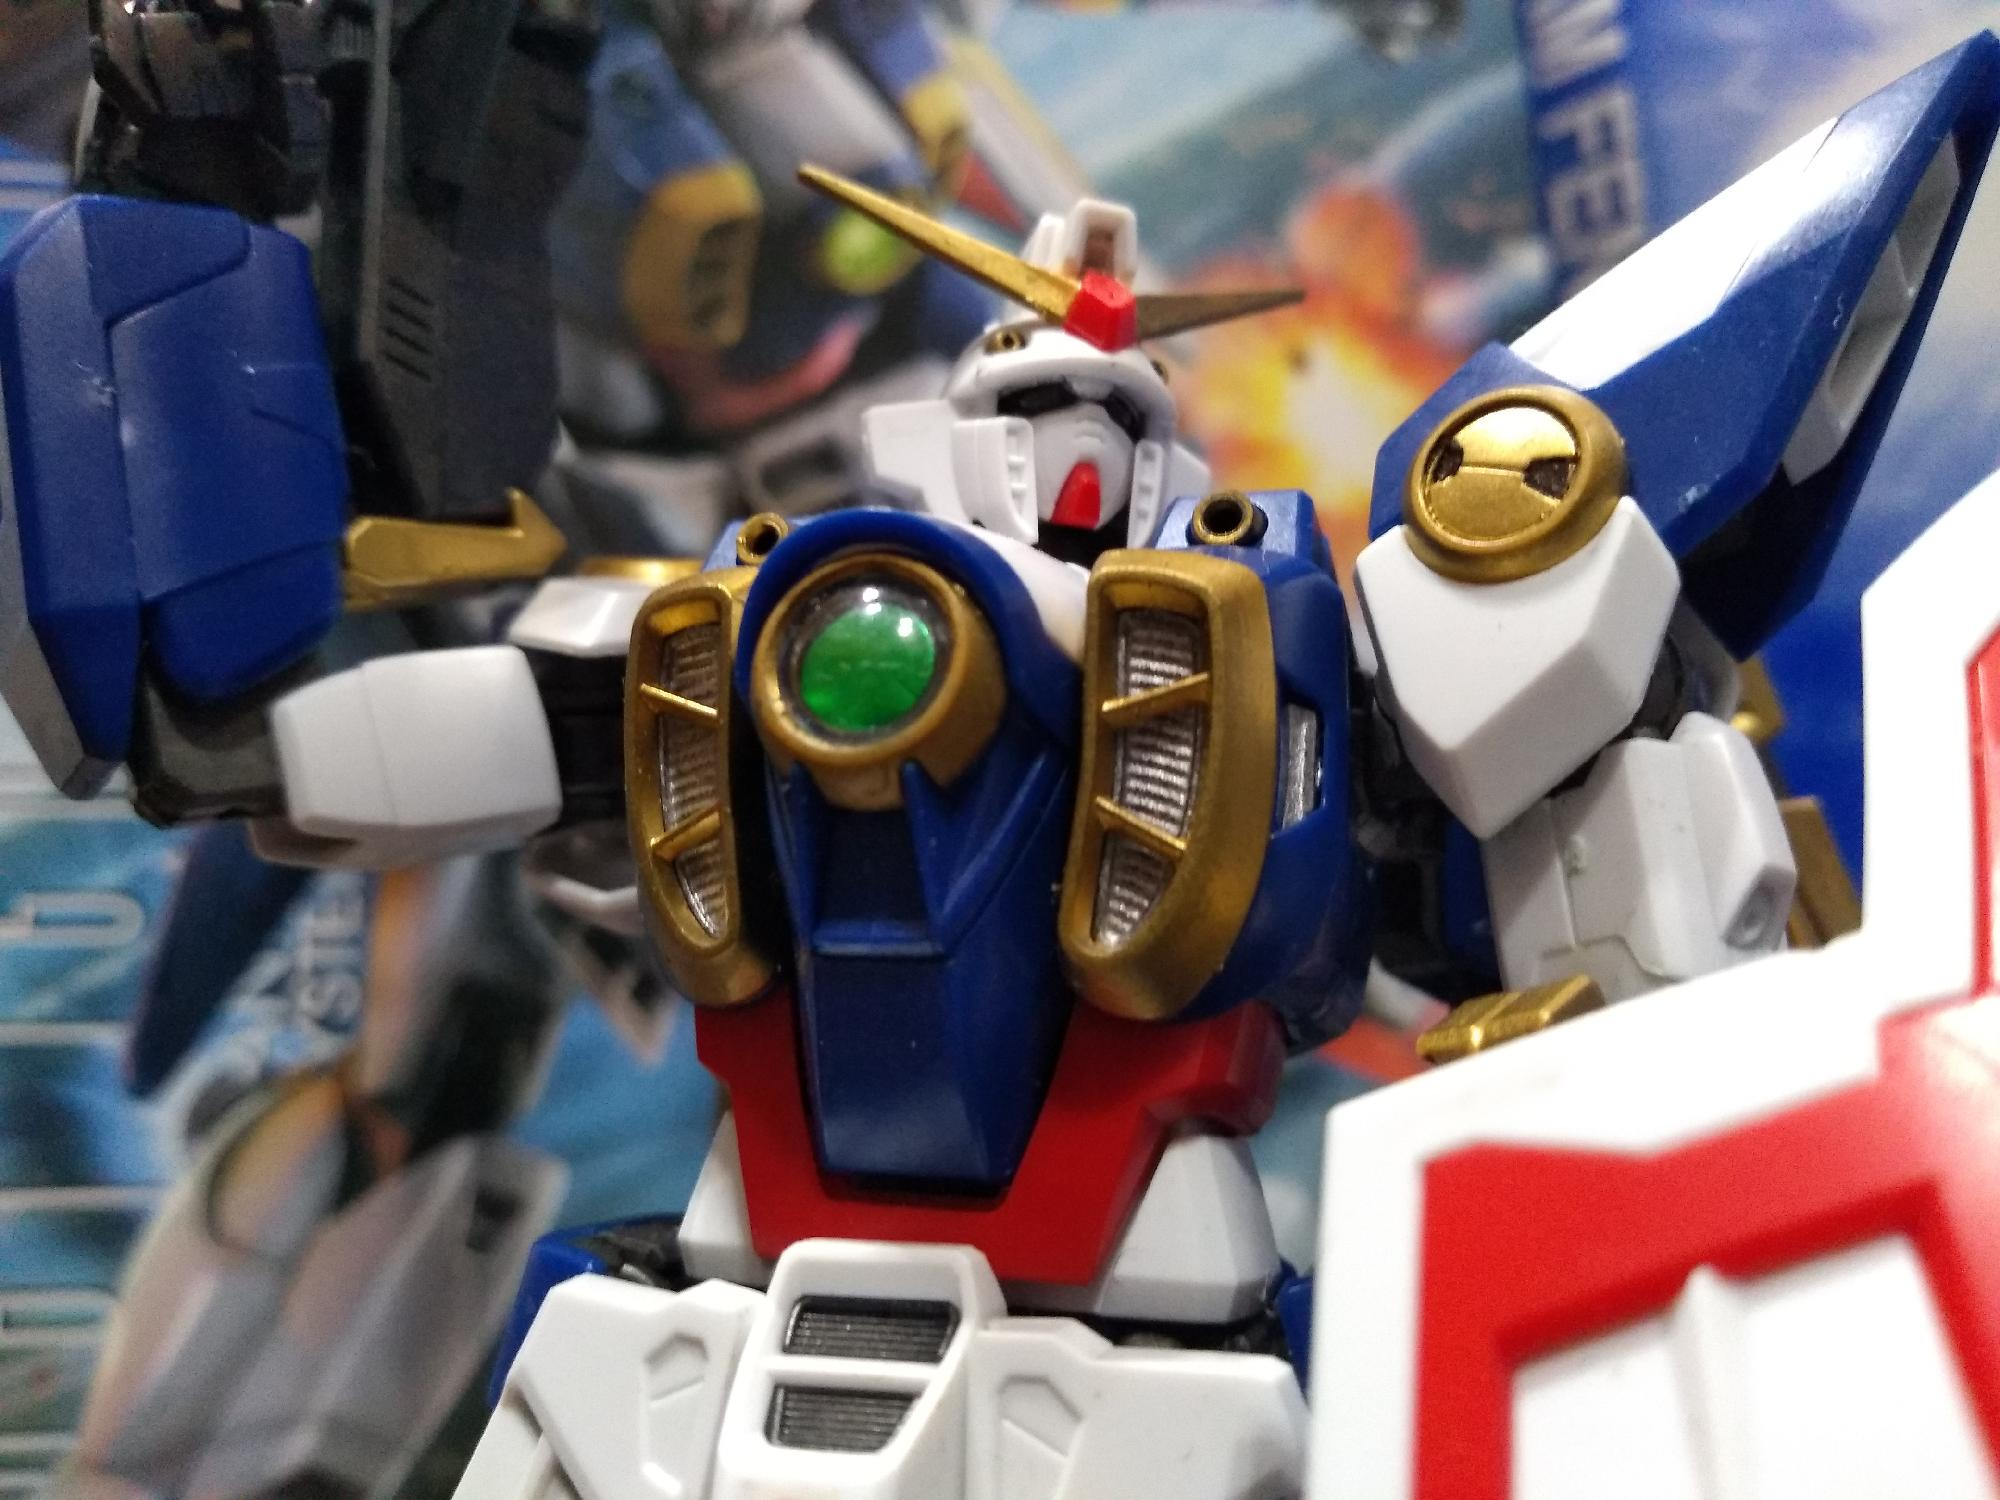 My all time favorite Gundam